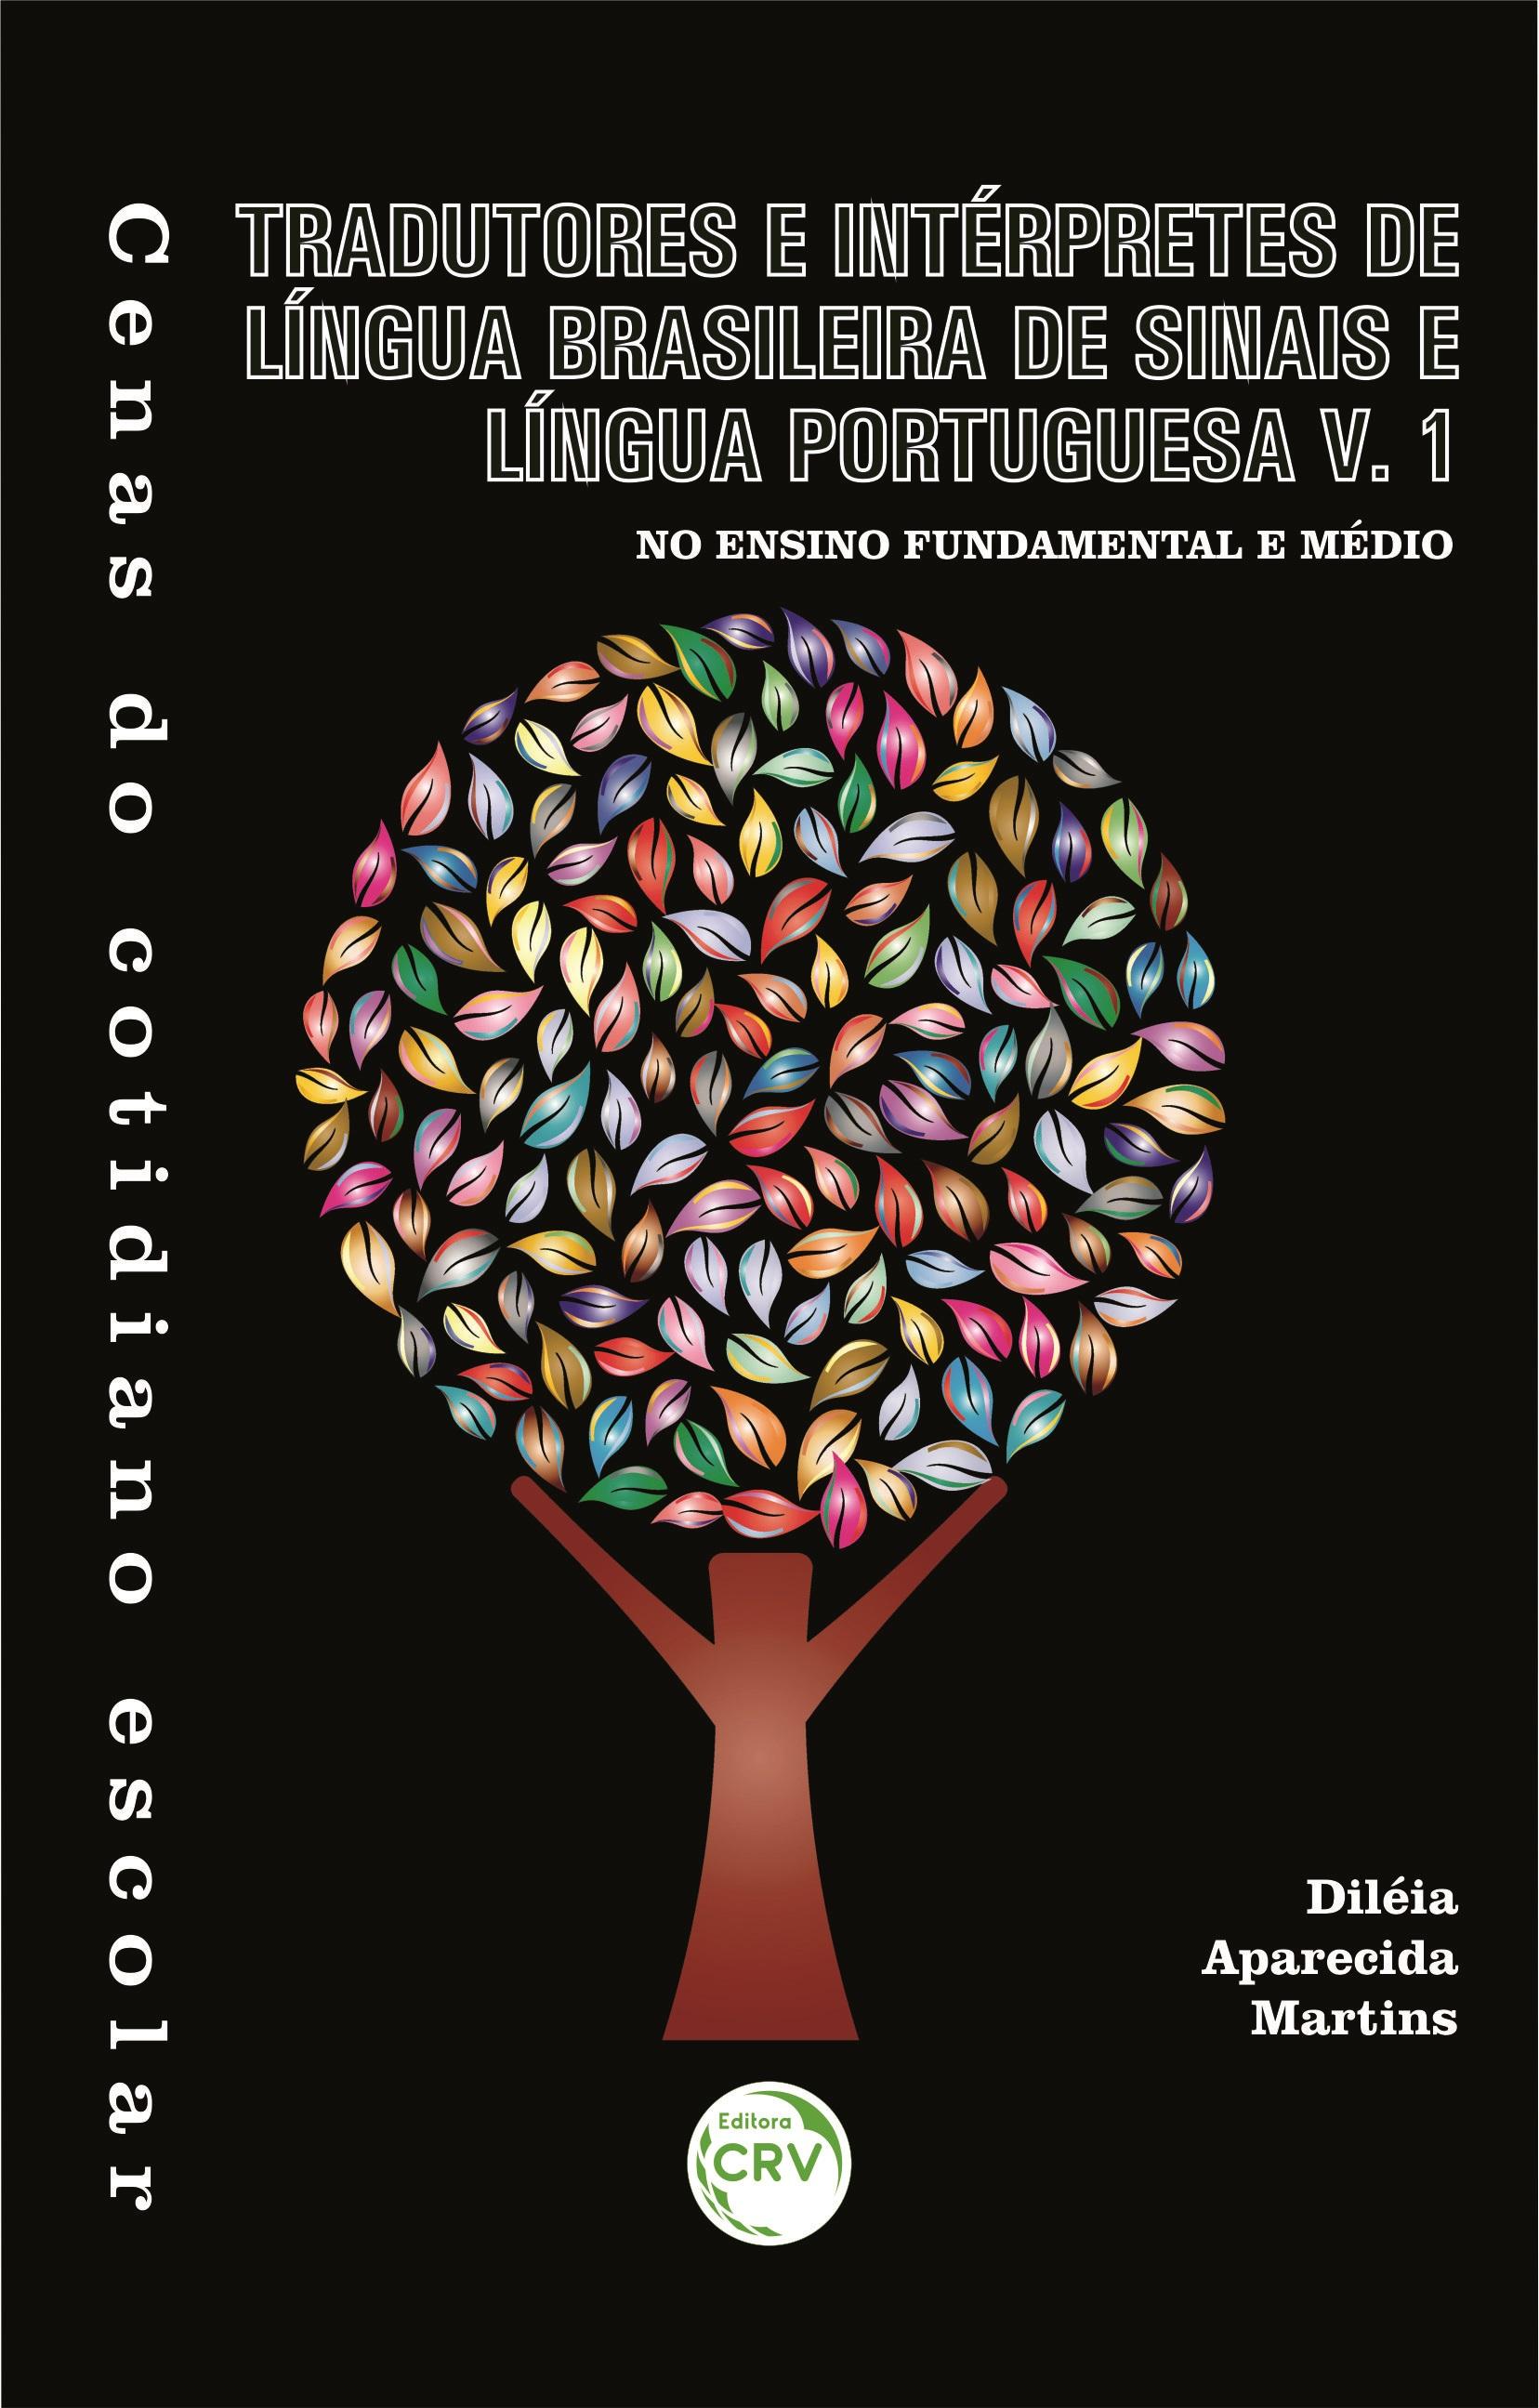 Capa do livro: CENAS DO COTIDIANO ESCOLAR:<br> tradutores e intérpretes de língua brasileira de sinais e língua portuguesa no ensino fundamental e médio v. 1